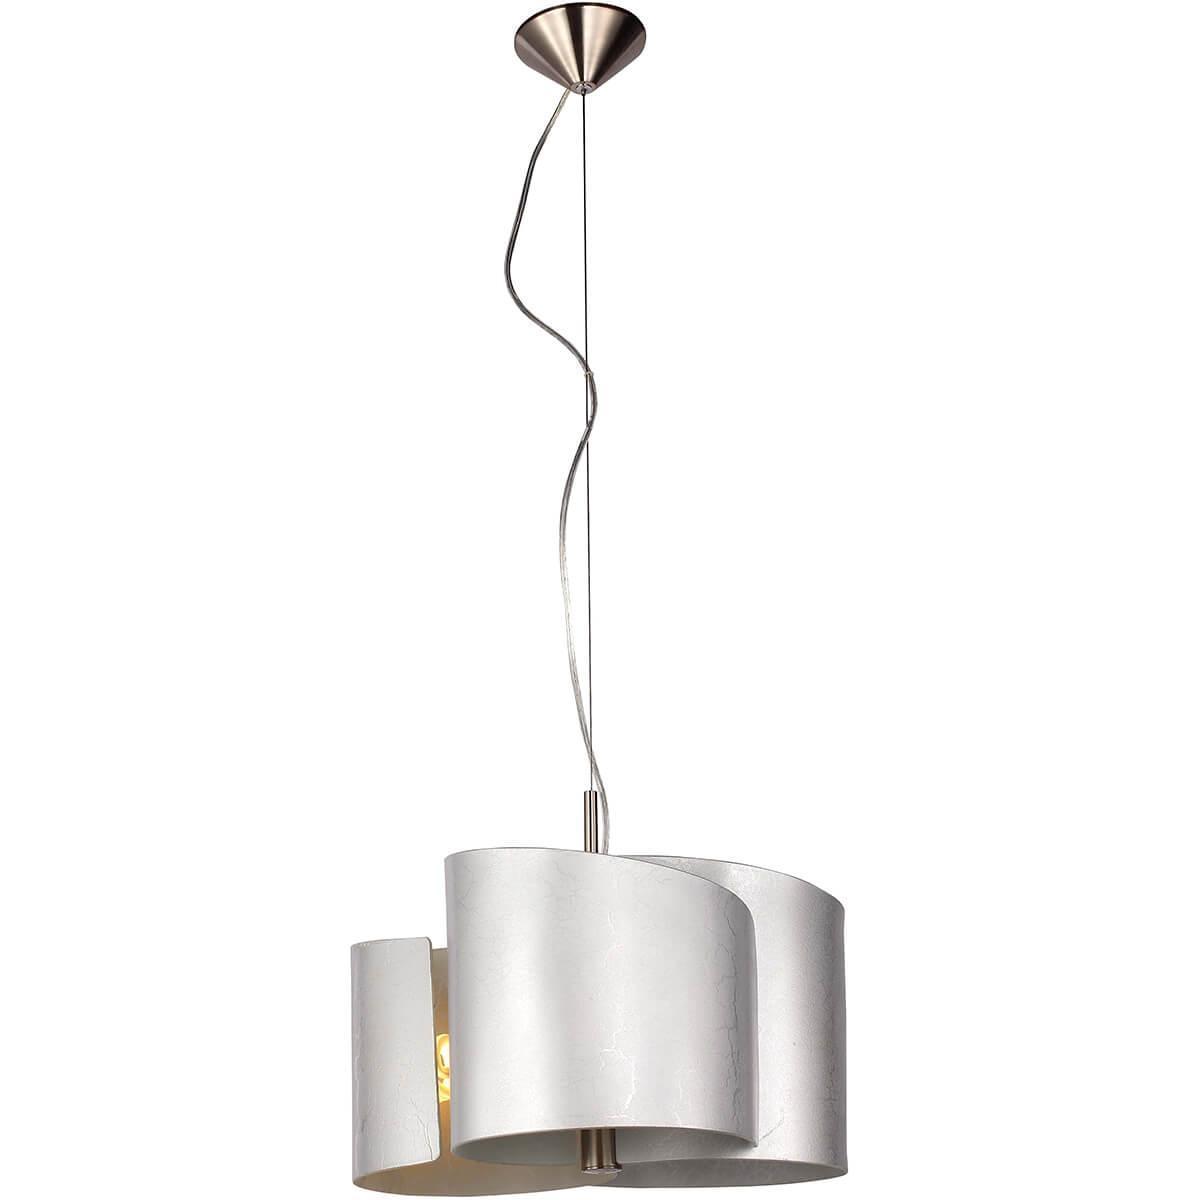 Подвесной светильник Lucia Tucci Vetro-argento 194.3 вставка la diva veronica tozzetto vetro a argento 2x2